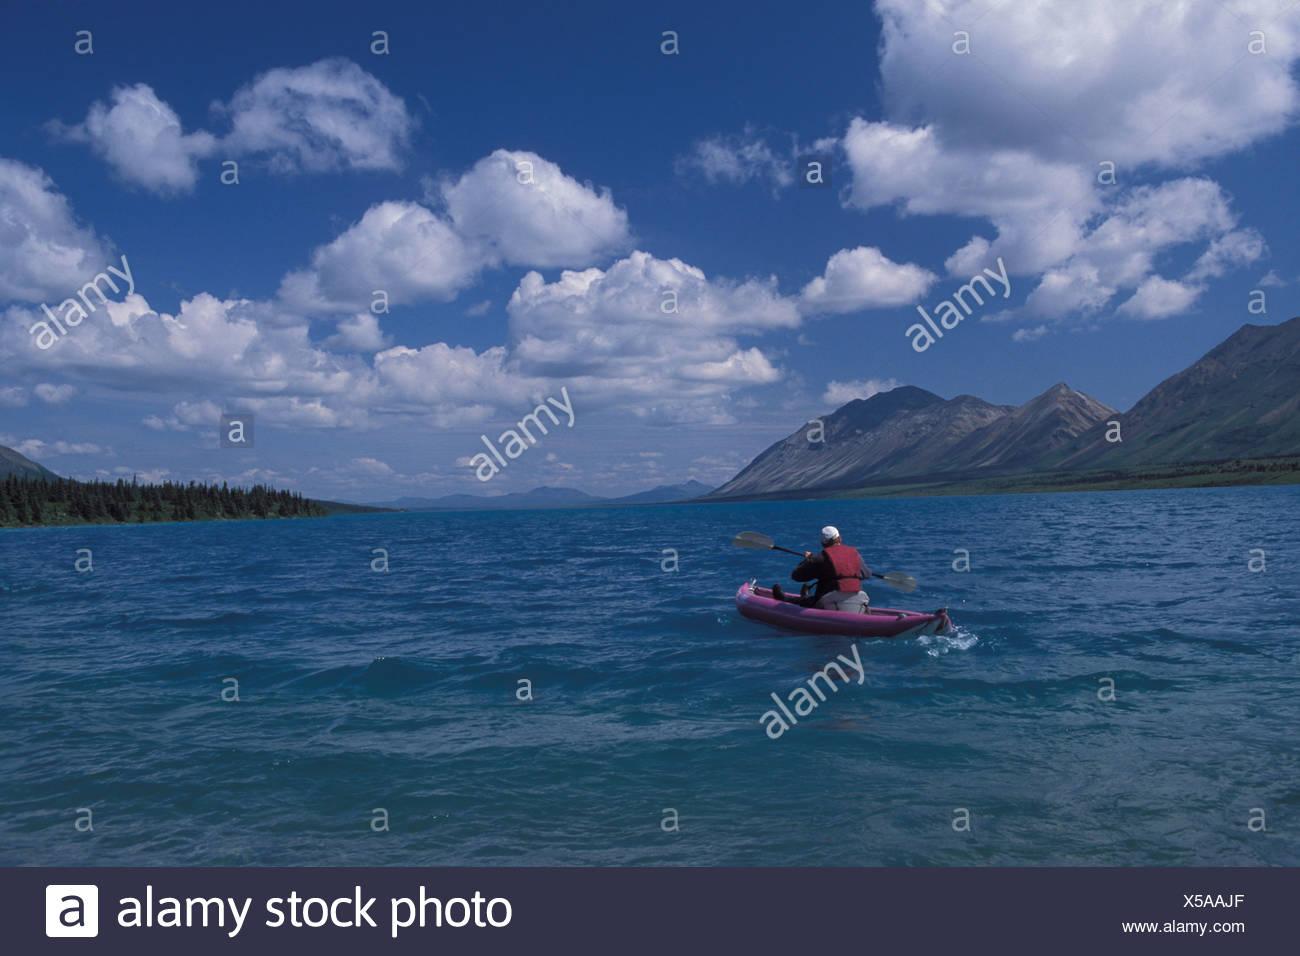 Kayaker Kayak Lake Clark national park Chigmit Mountains Alaska USA America United States North America wild - Stock Image